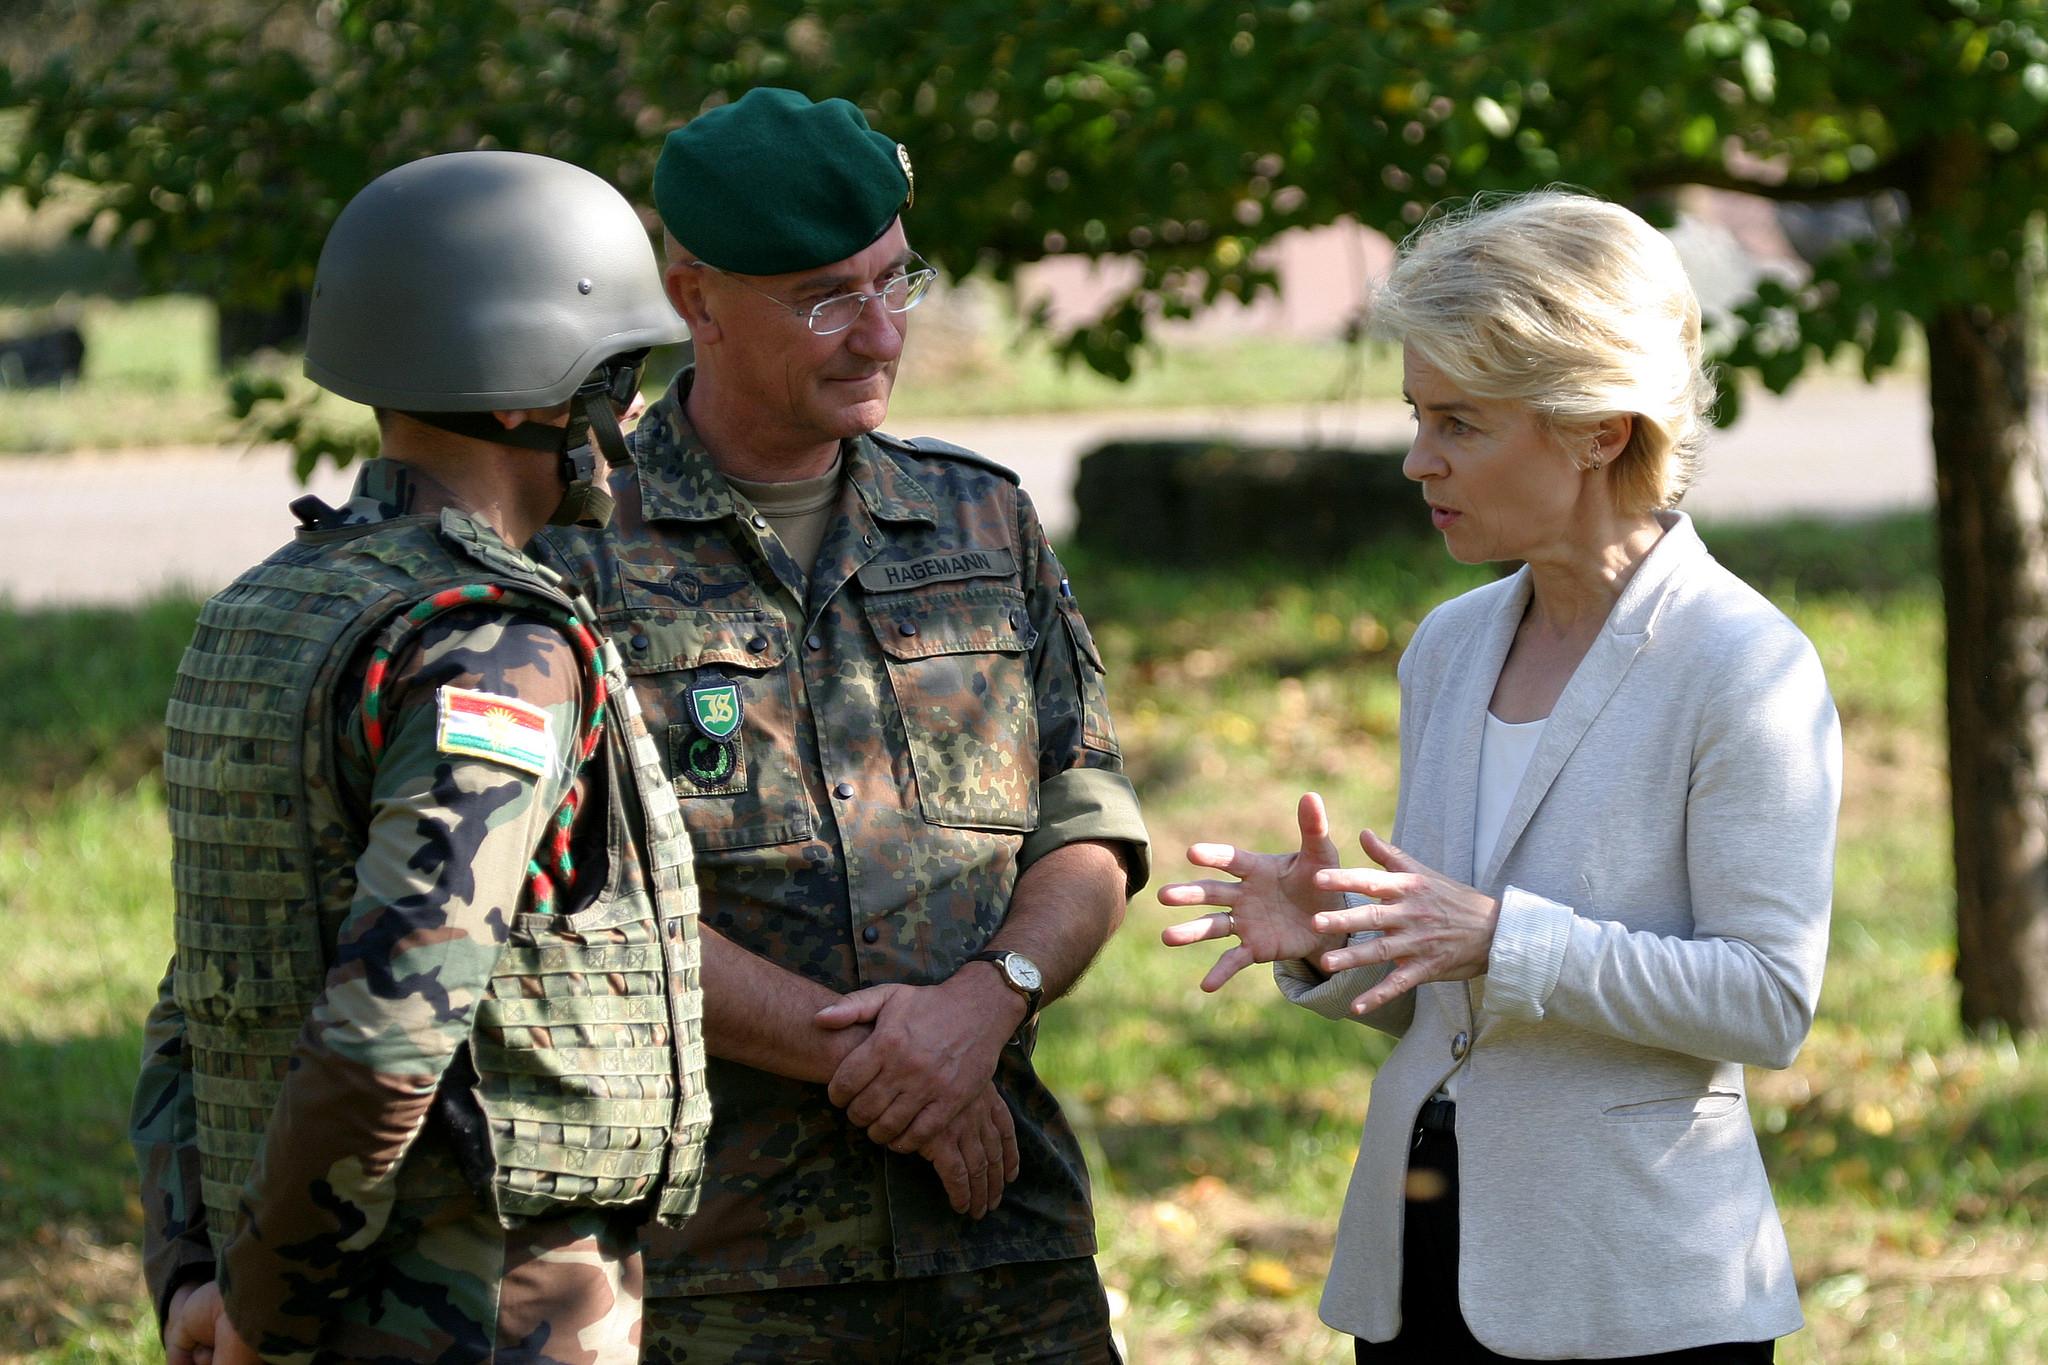 German Defense Minister Ursula von der Leyen speaks with German troops during a training exercise on 2 October, 2014. [Medien Bundeswehr/Flickr]